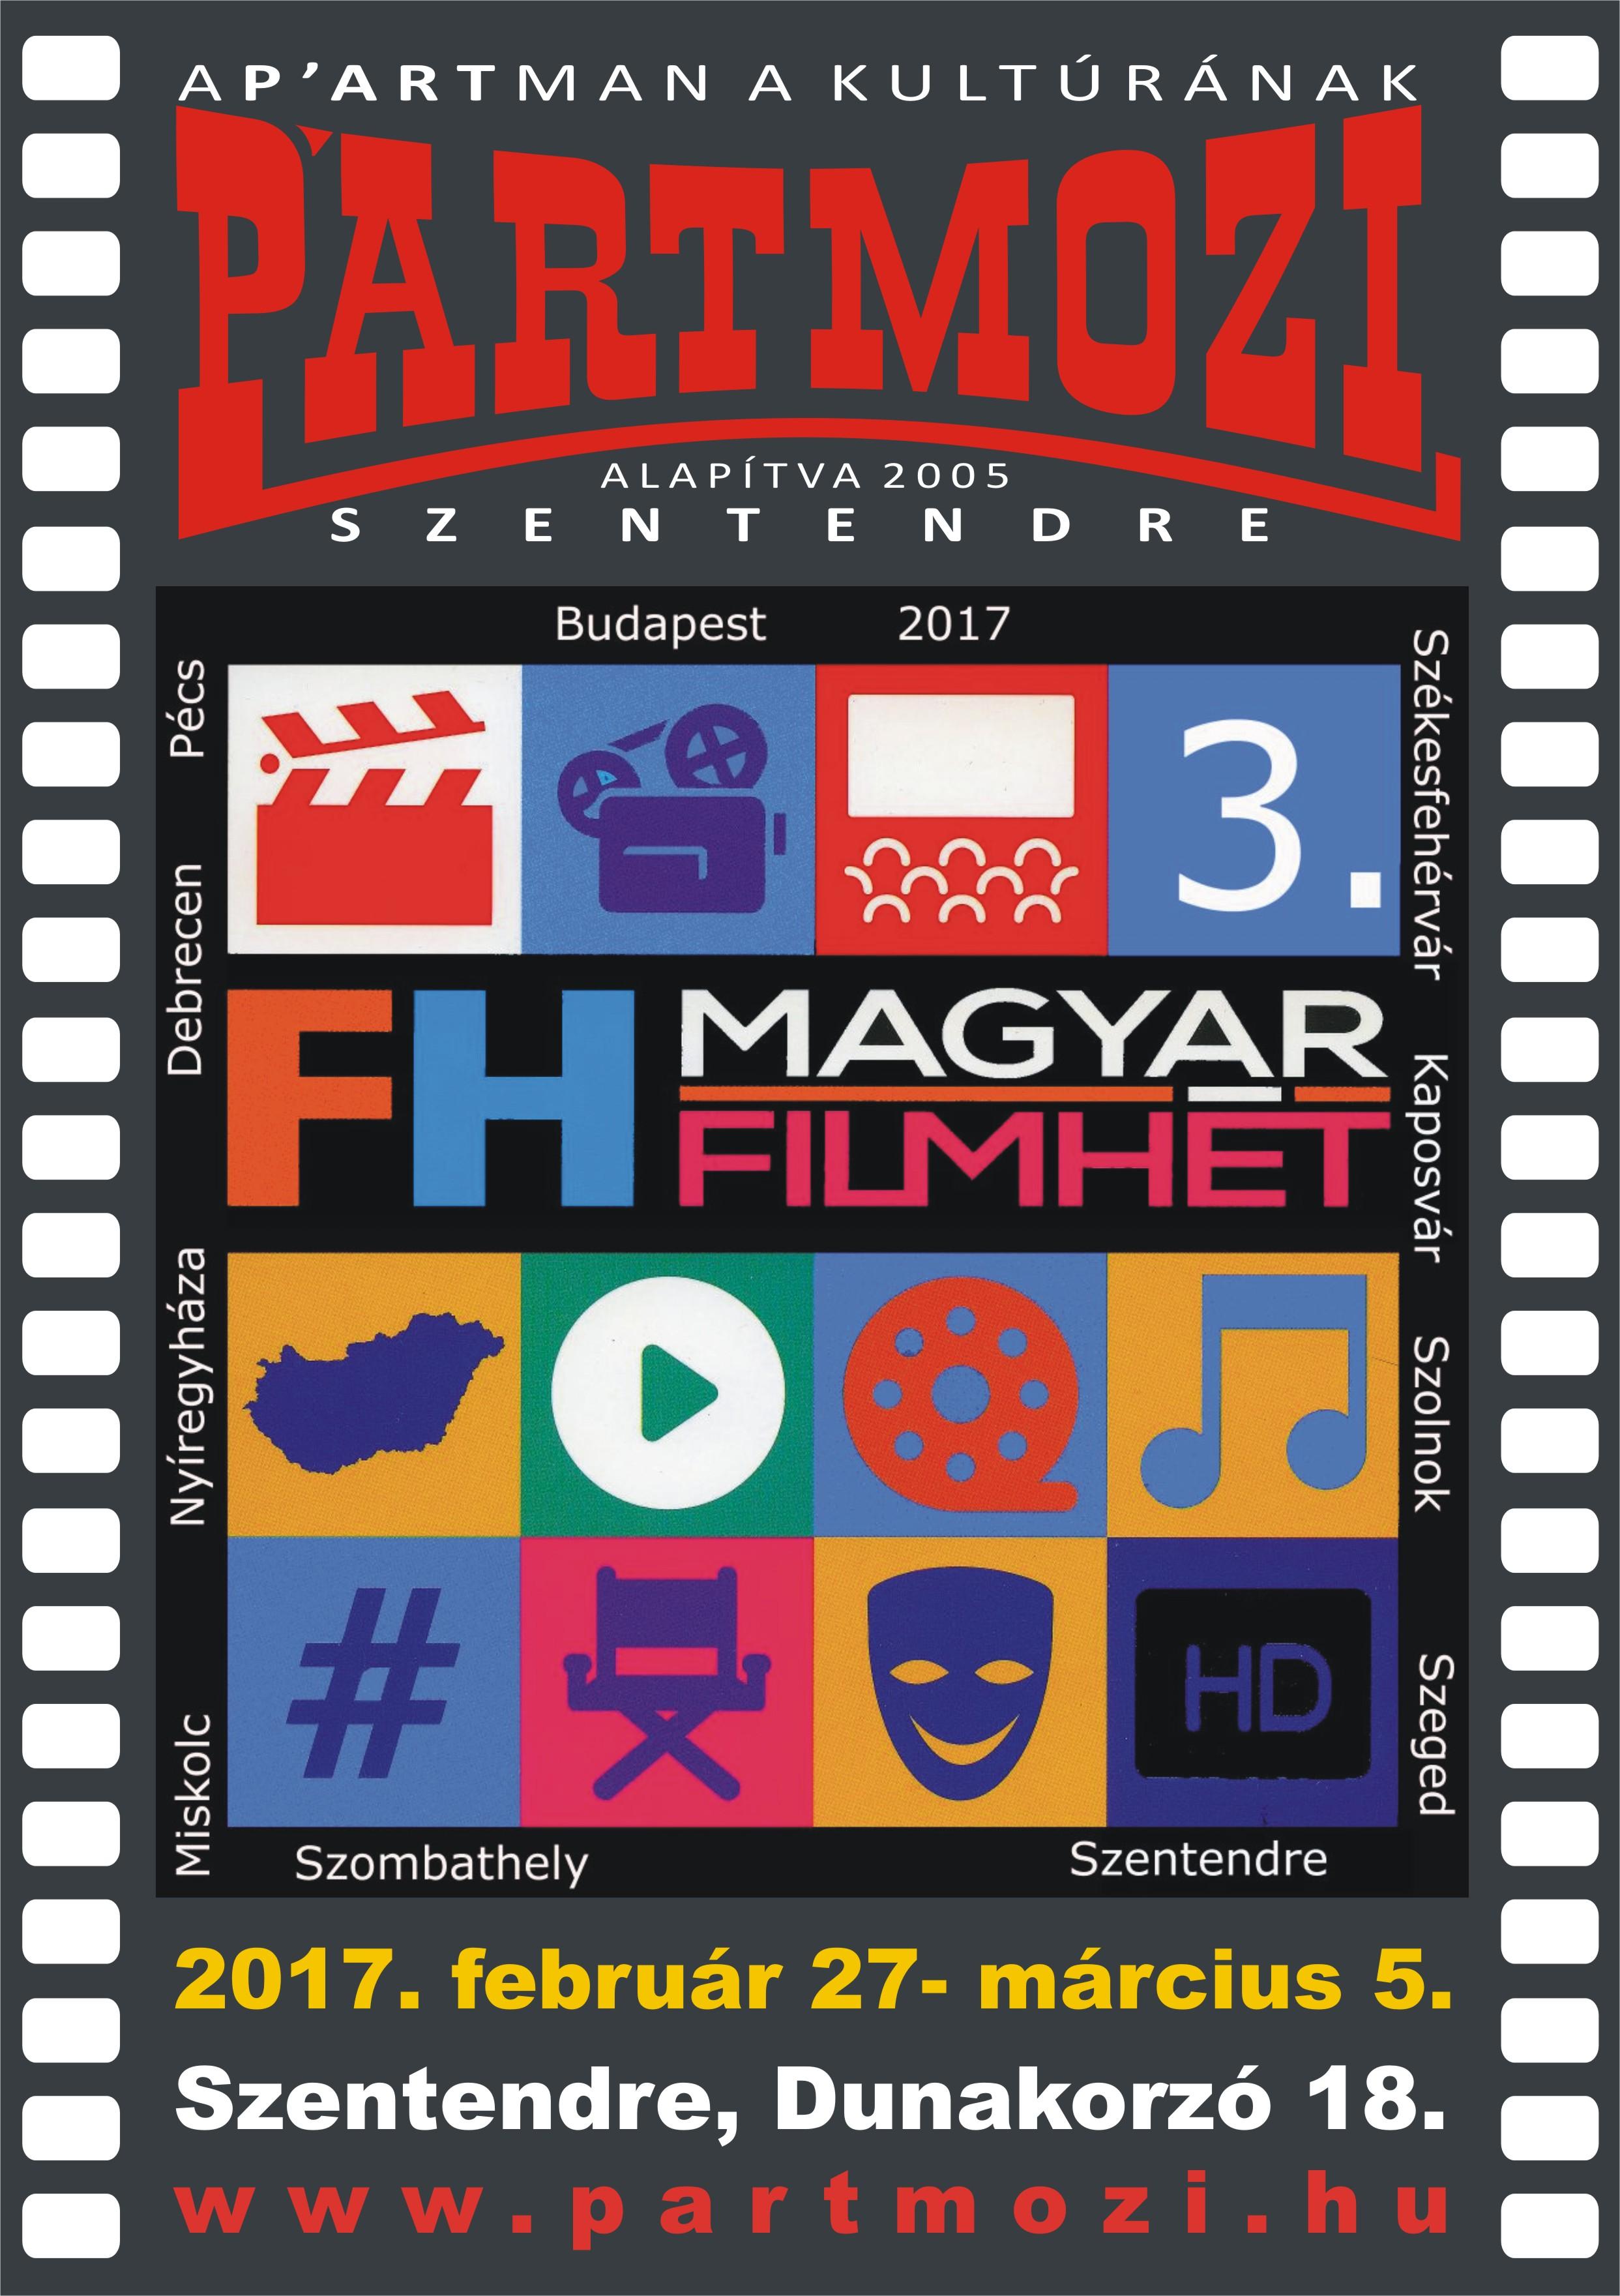 magyar-filmhet-plakat-2017.jpg